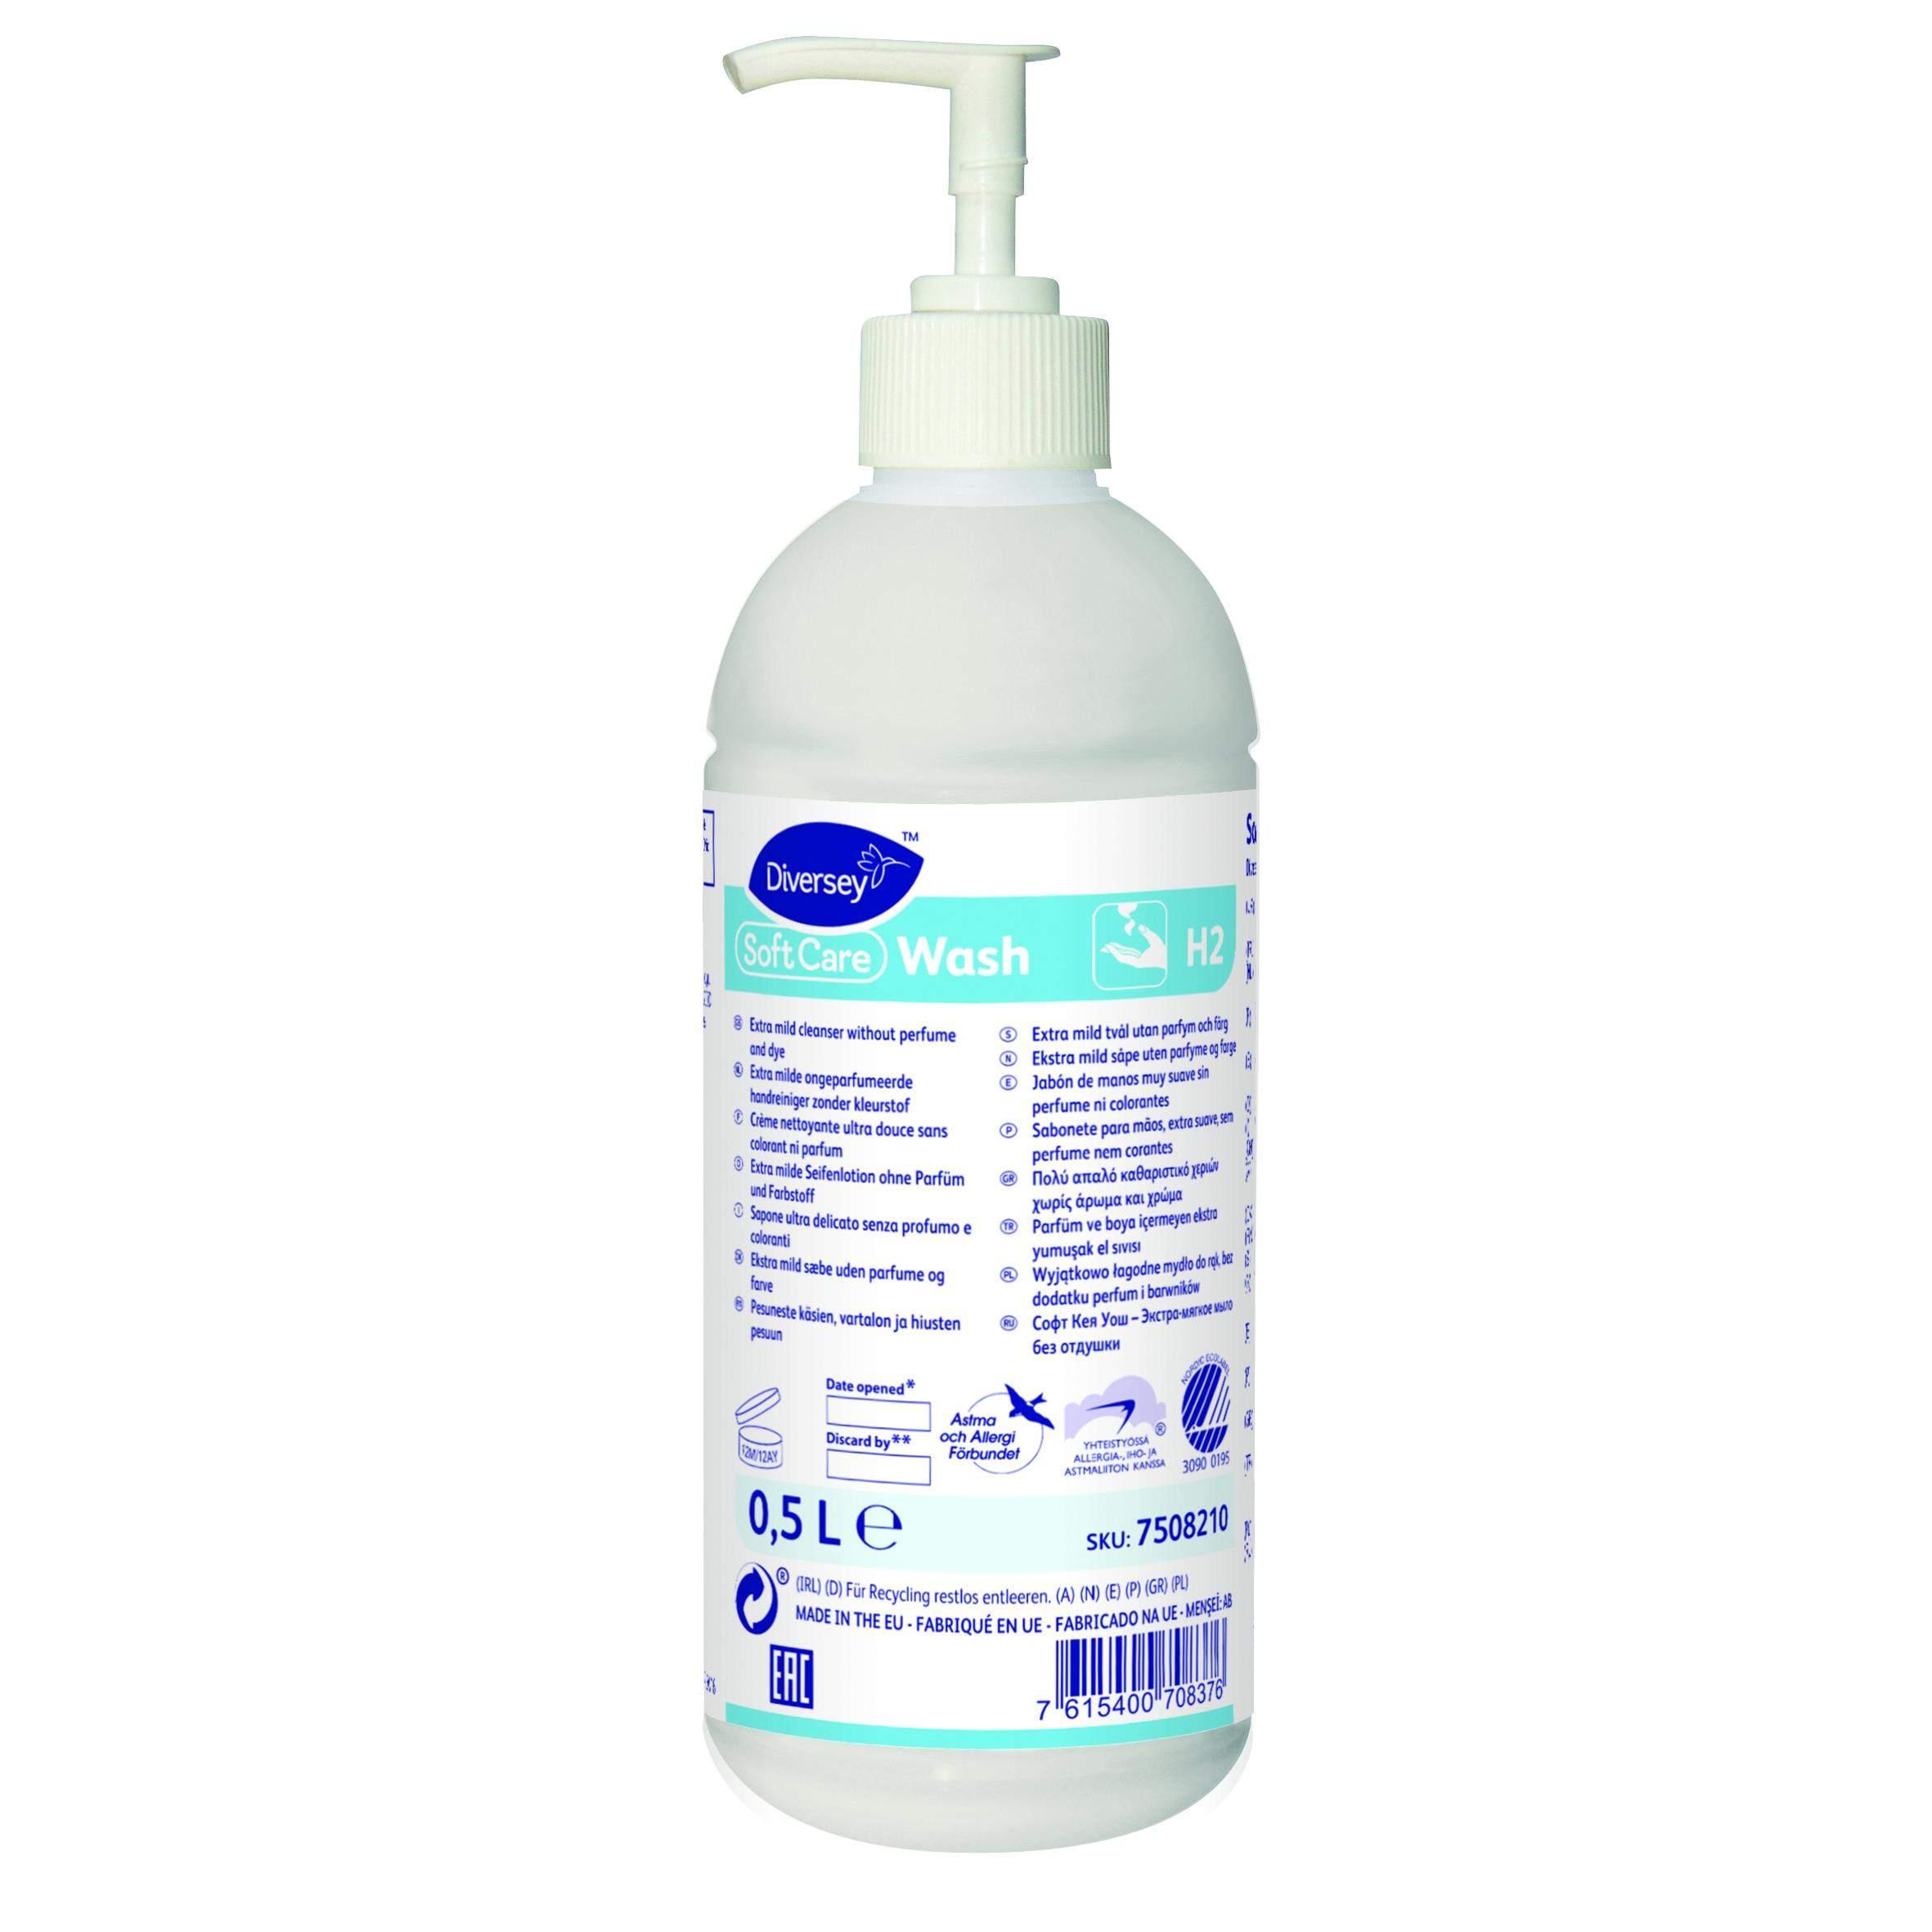 7508210-Soft-Care-Wash-H2-0.5L-CMYK-20x20cm.jpg